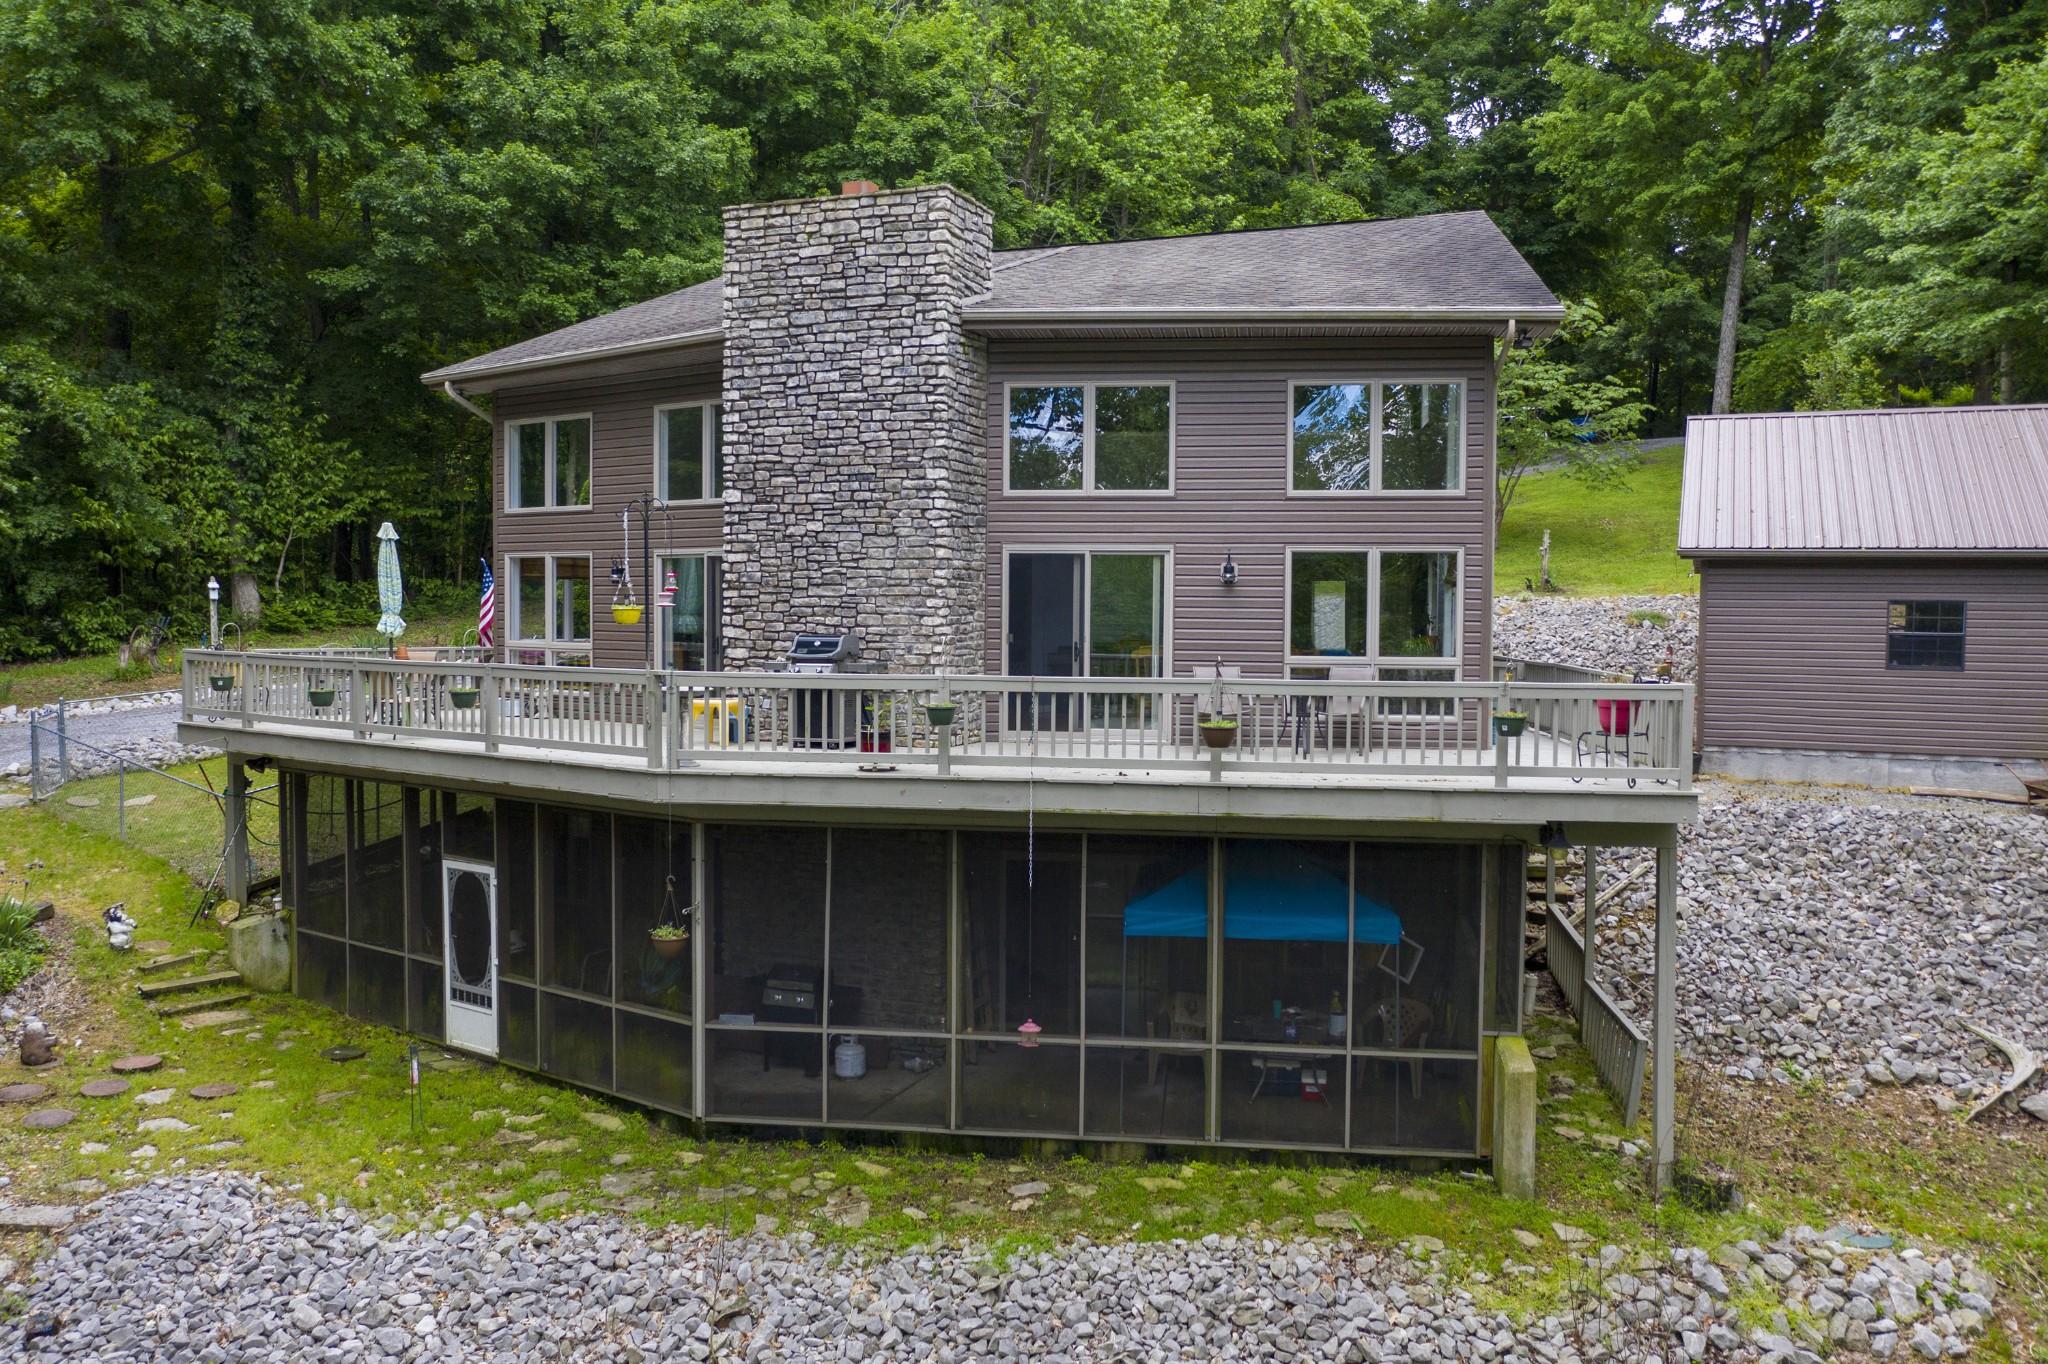 897 N Worthington Way Property Photo - Eddyville, KY real estate listing